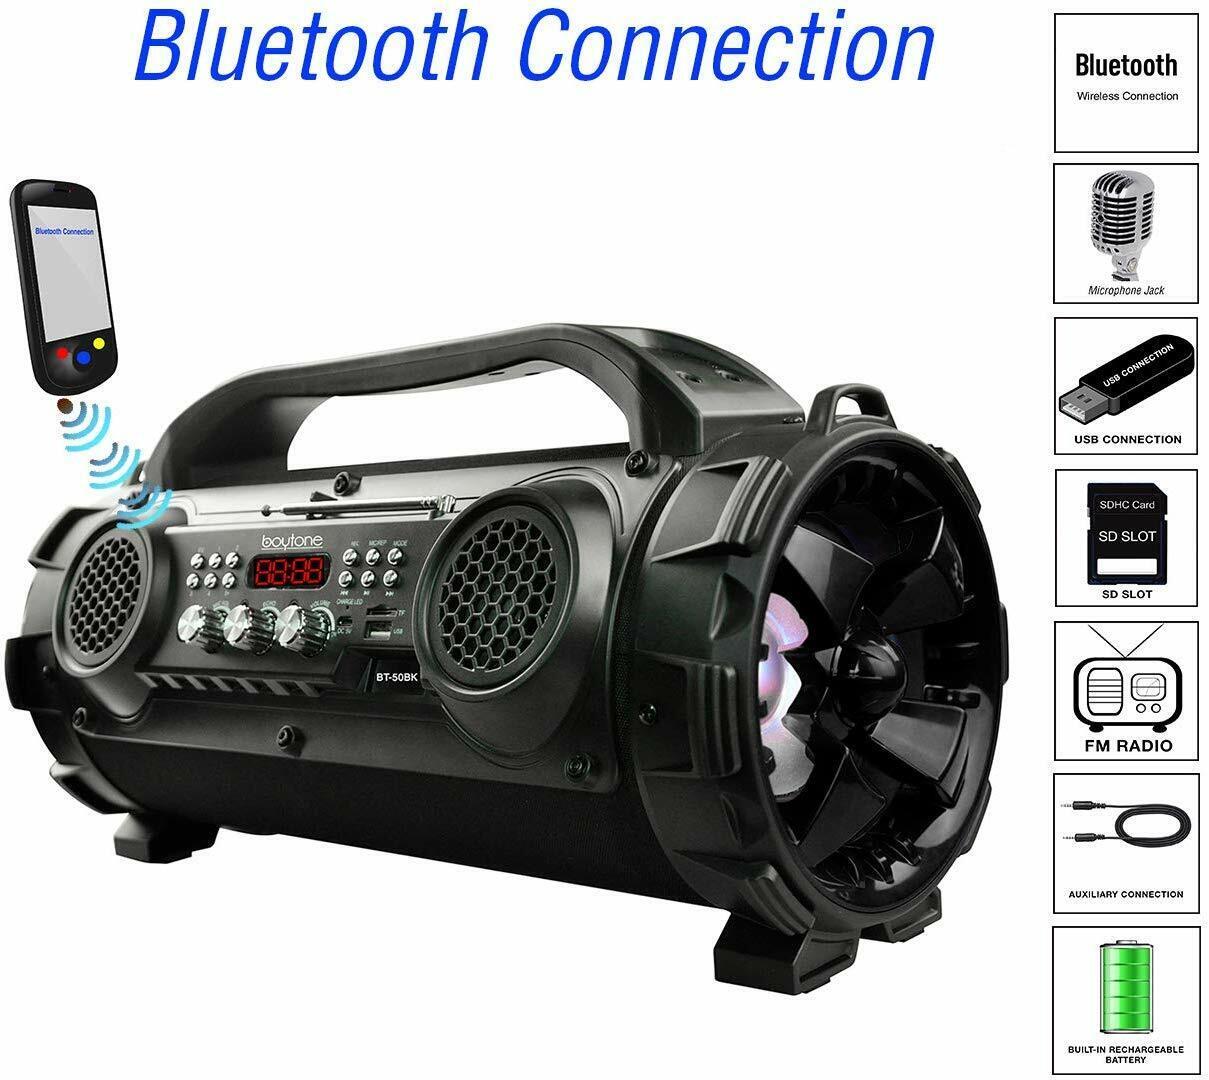 Boytone BT-50BK Portable Bluetooth Boombox Speaker, Indoor/O